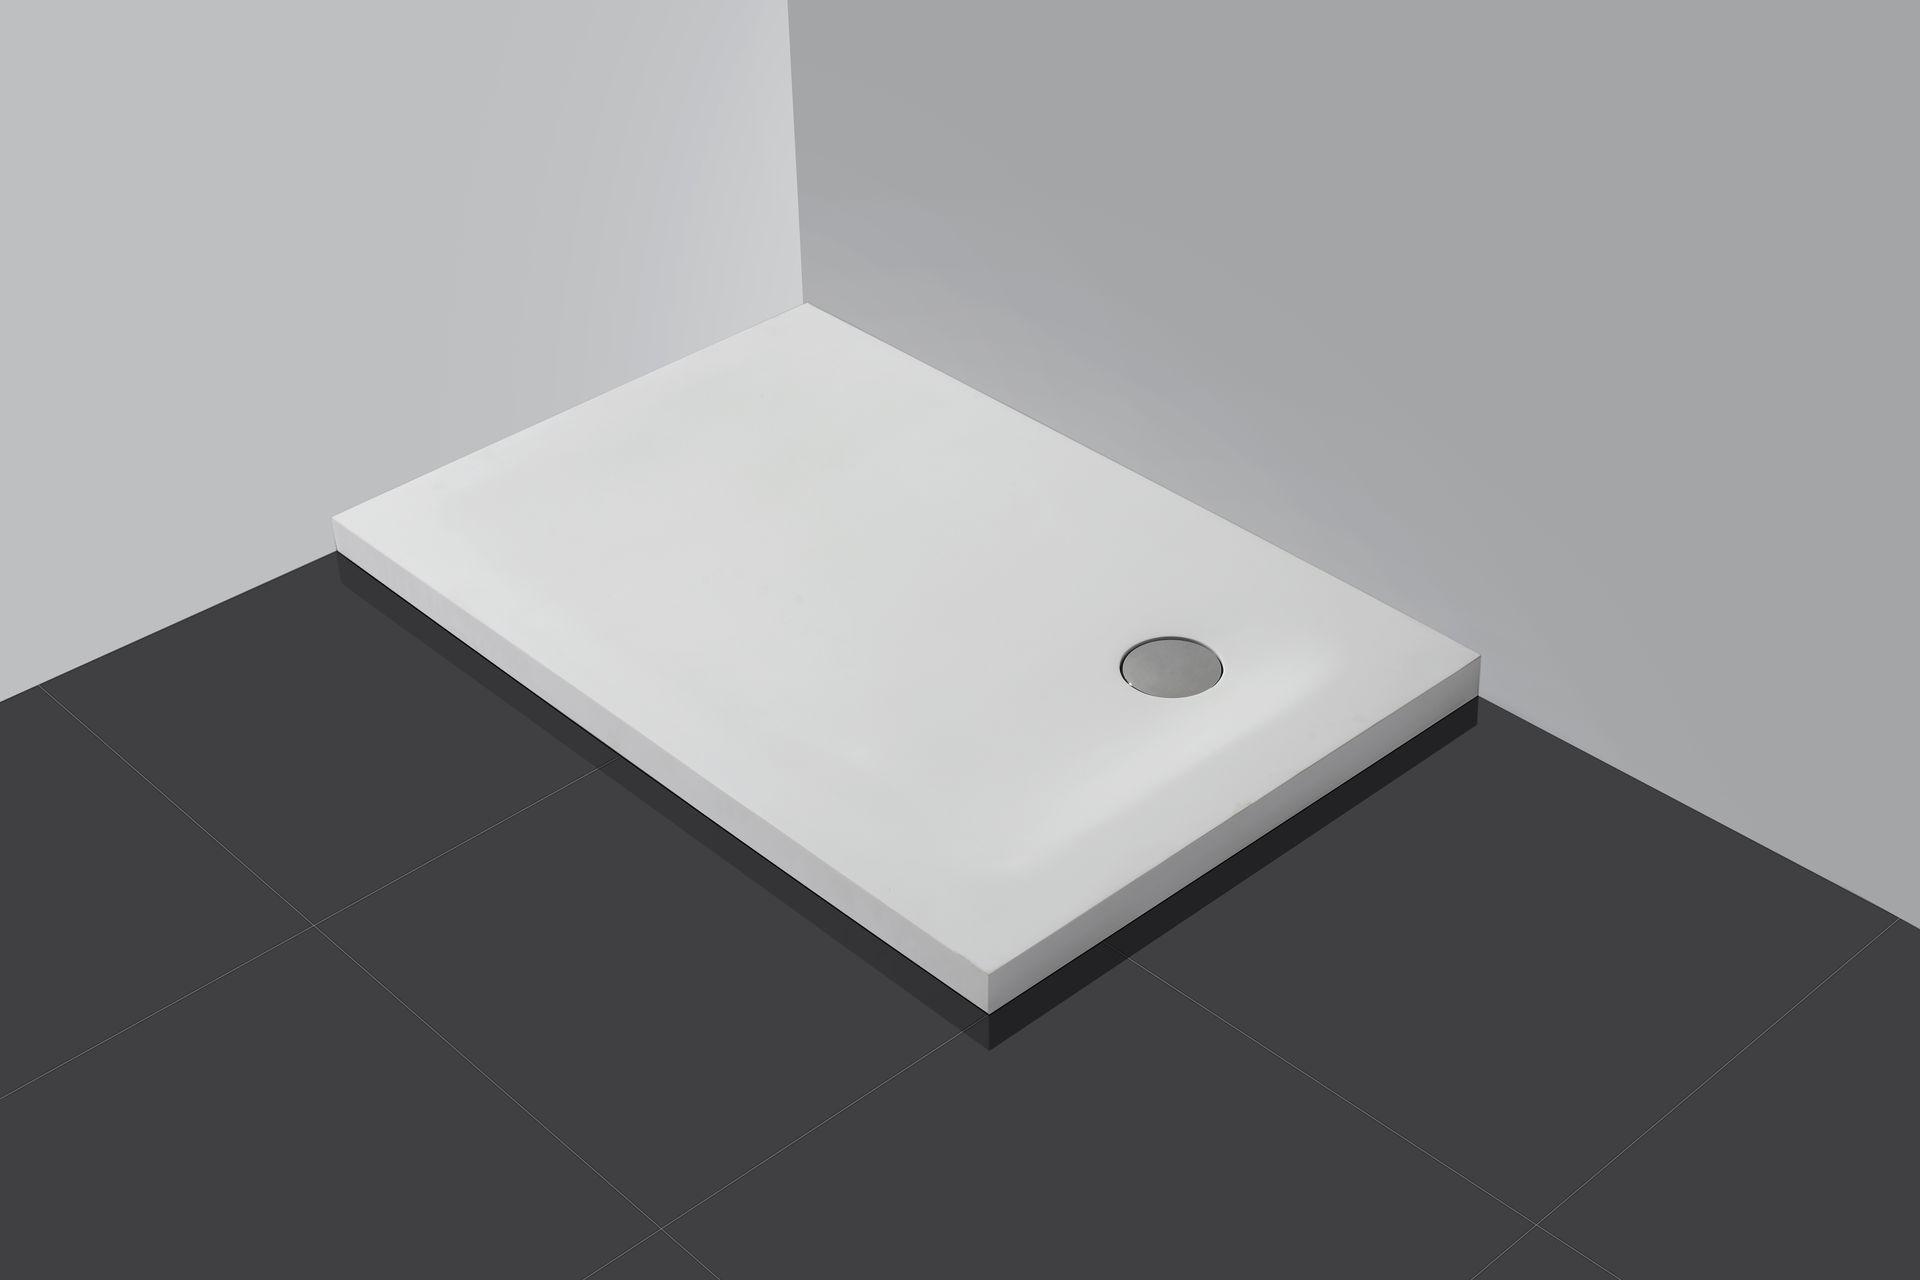 mineralguss duschtasse 120 x 90 x 5 cm glasdeals. Black Bedroom Furniture Sets. Home Design Ideas